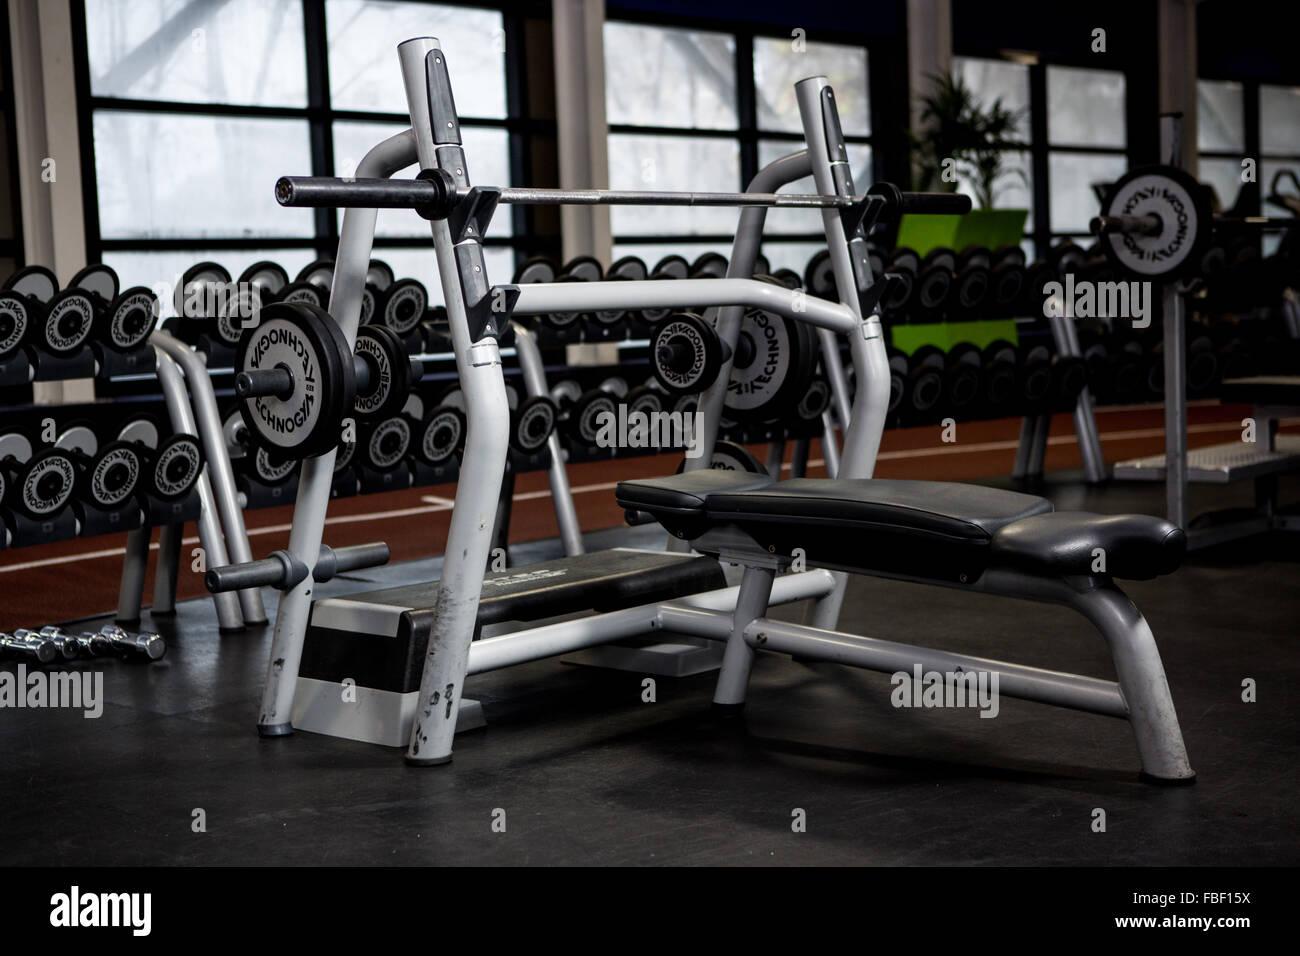 Weightlifting machine - Stock Image